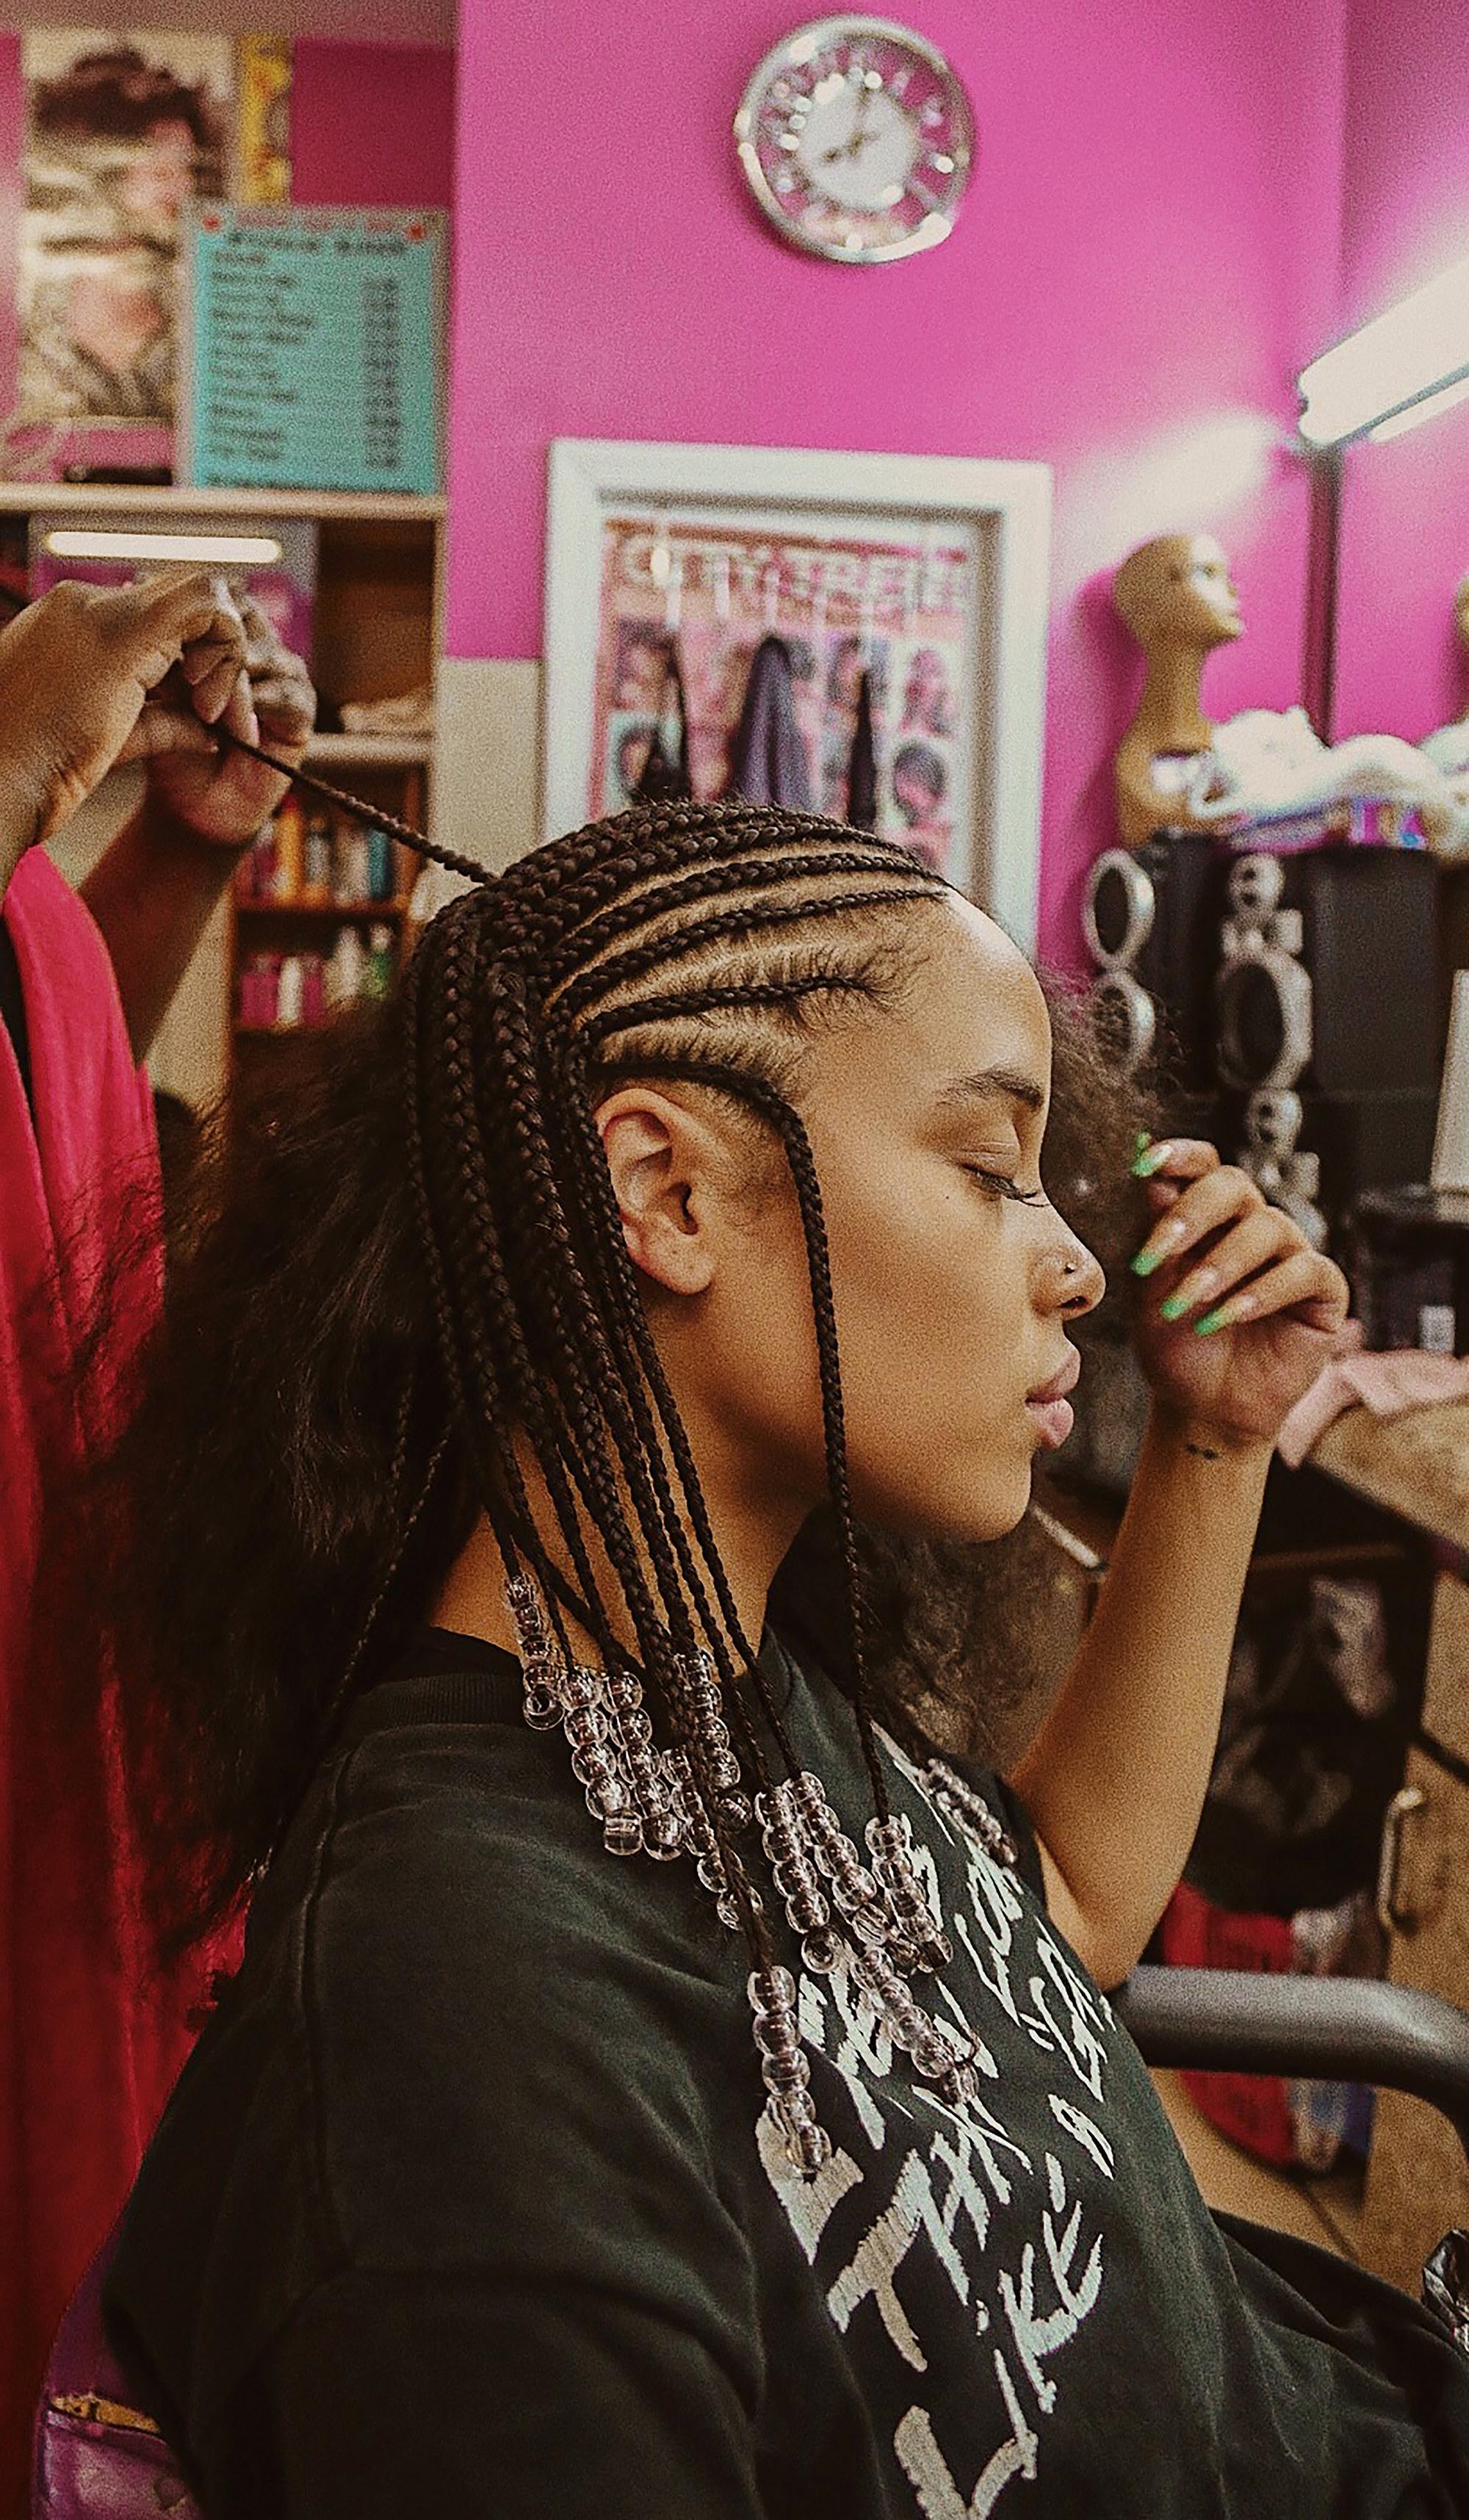 A woman sits while a hairdresser braids her hair